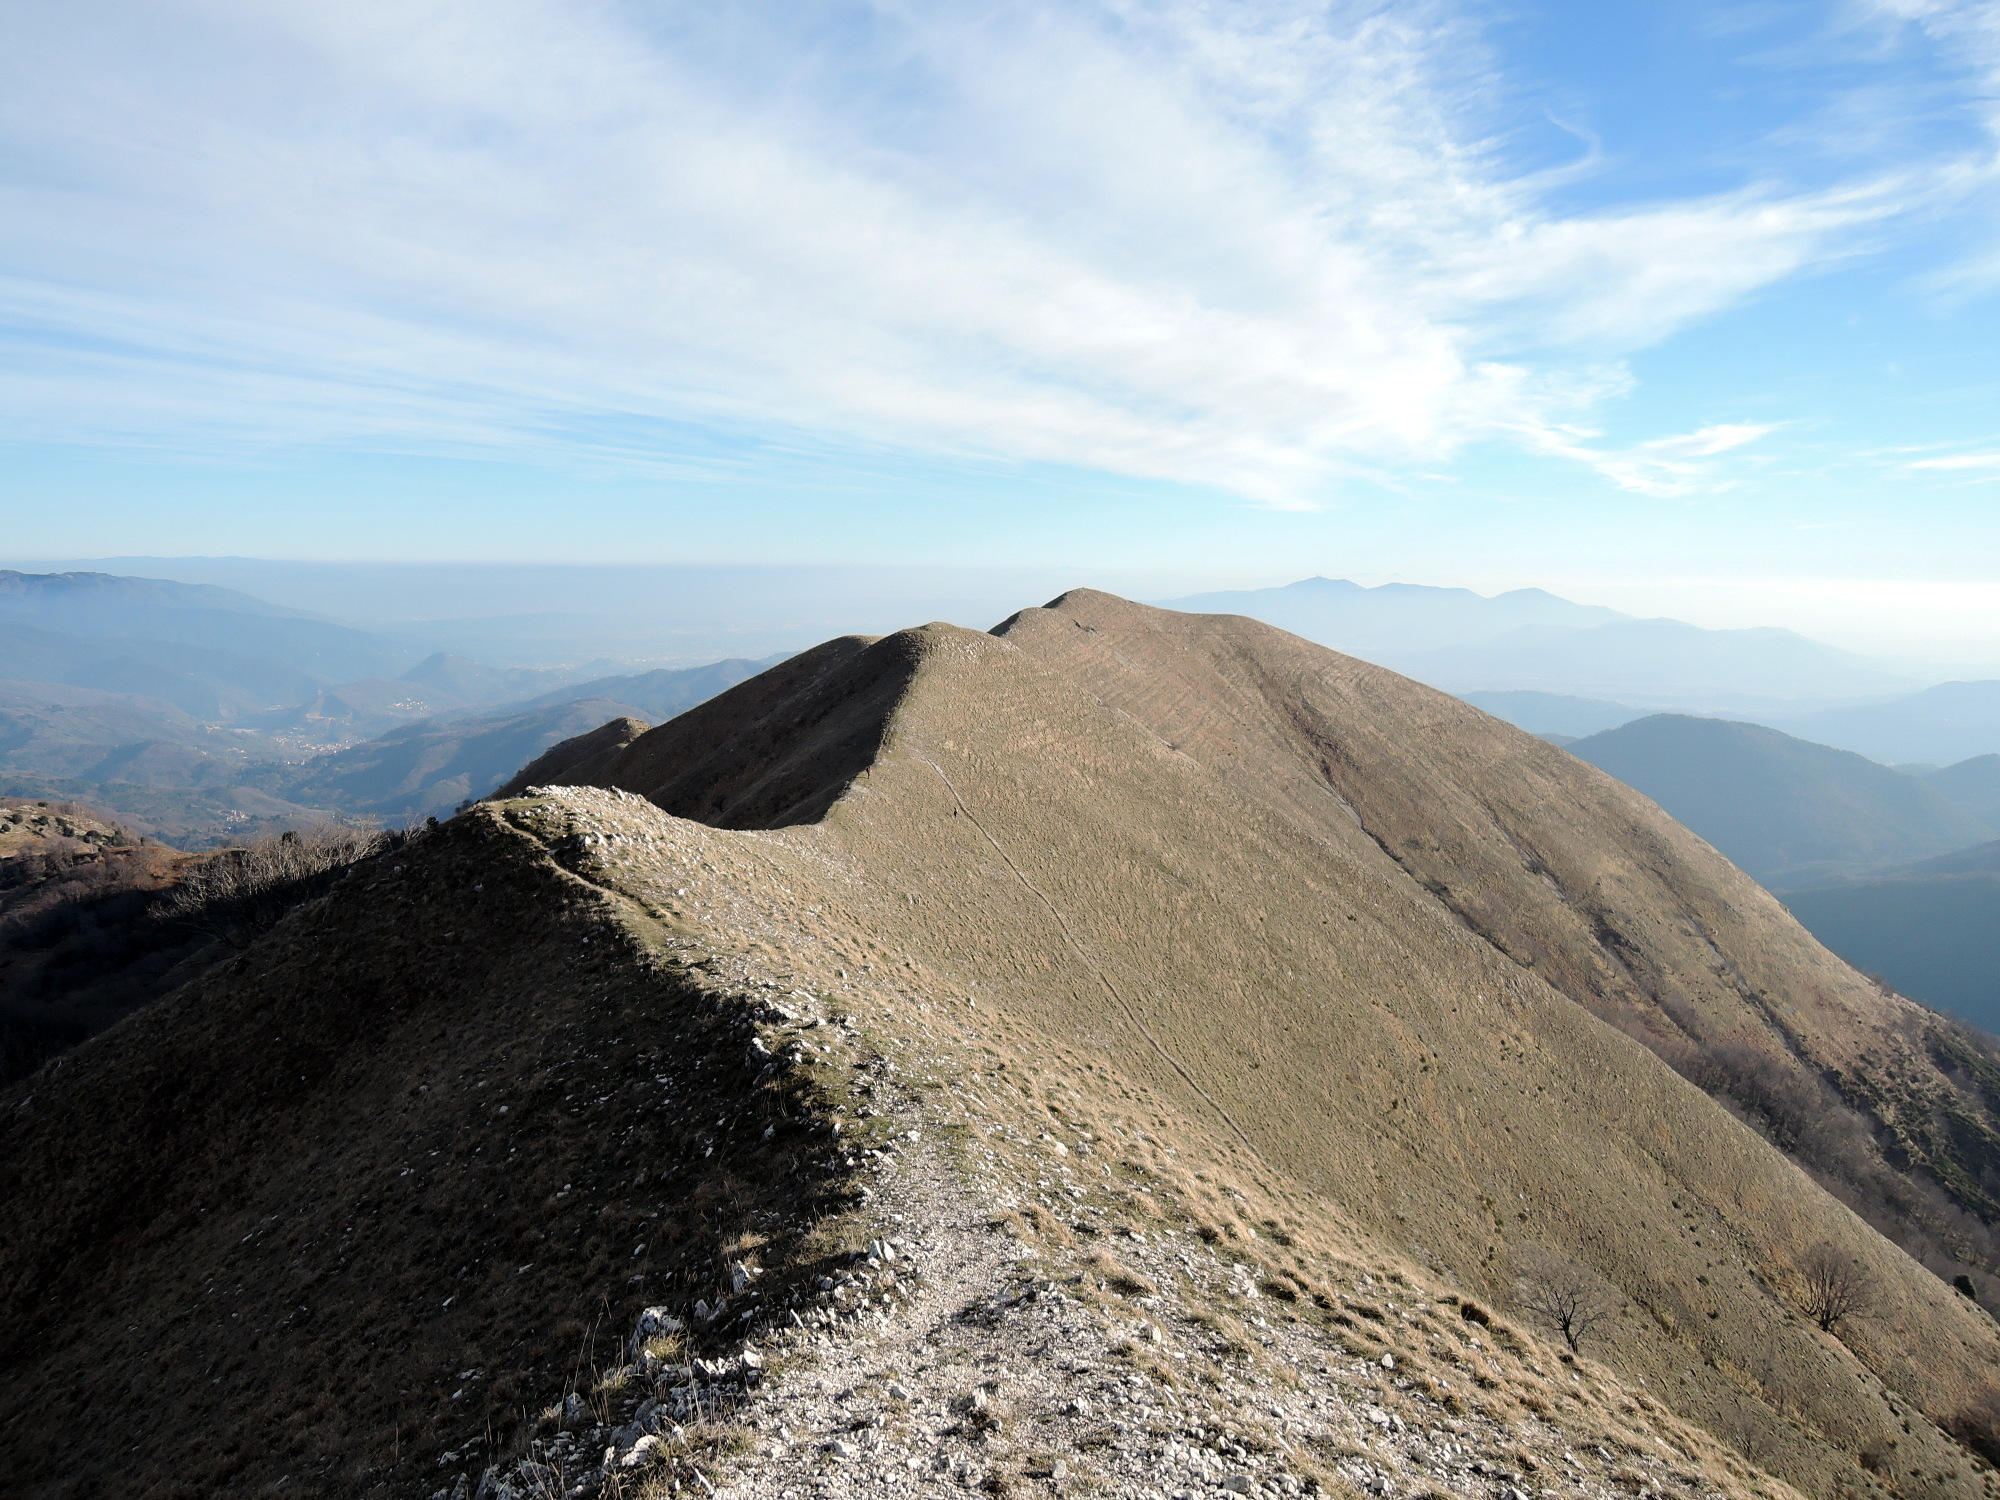 Mount Piglione